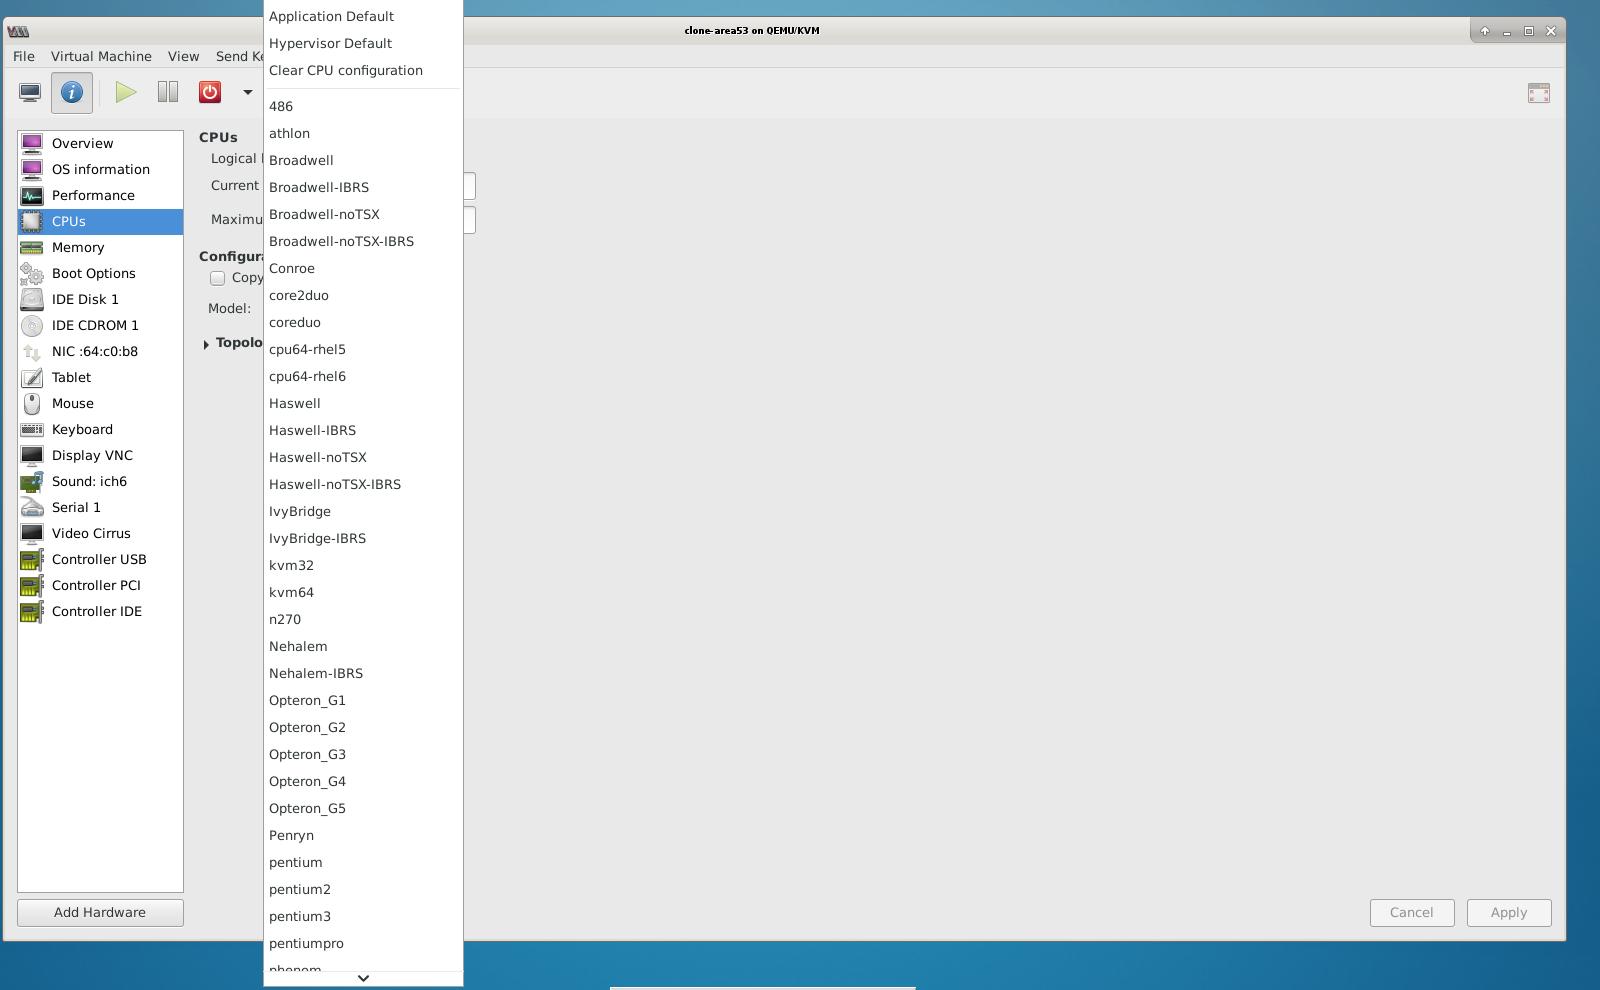 virtual-manager cpu list